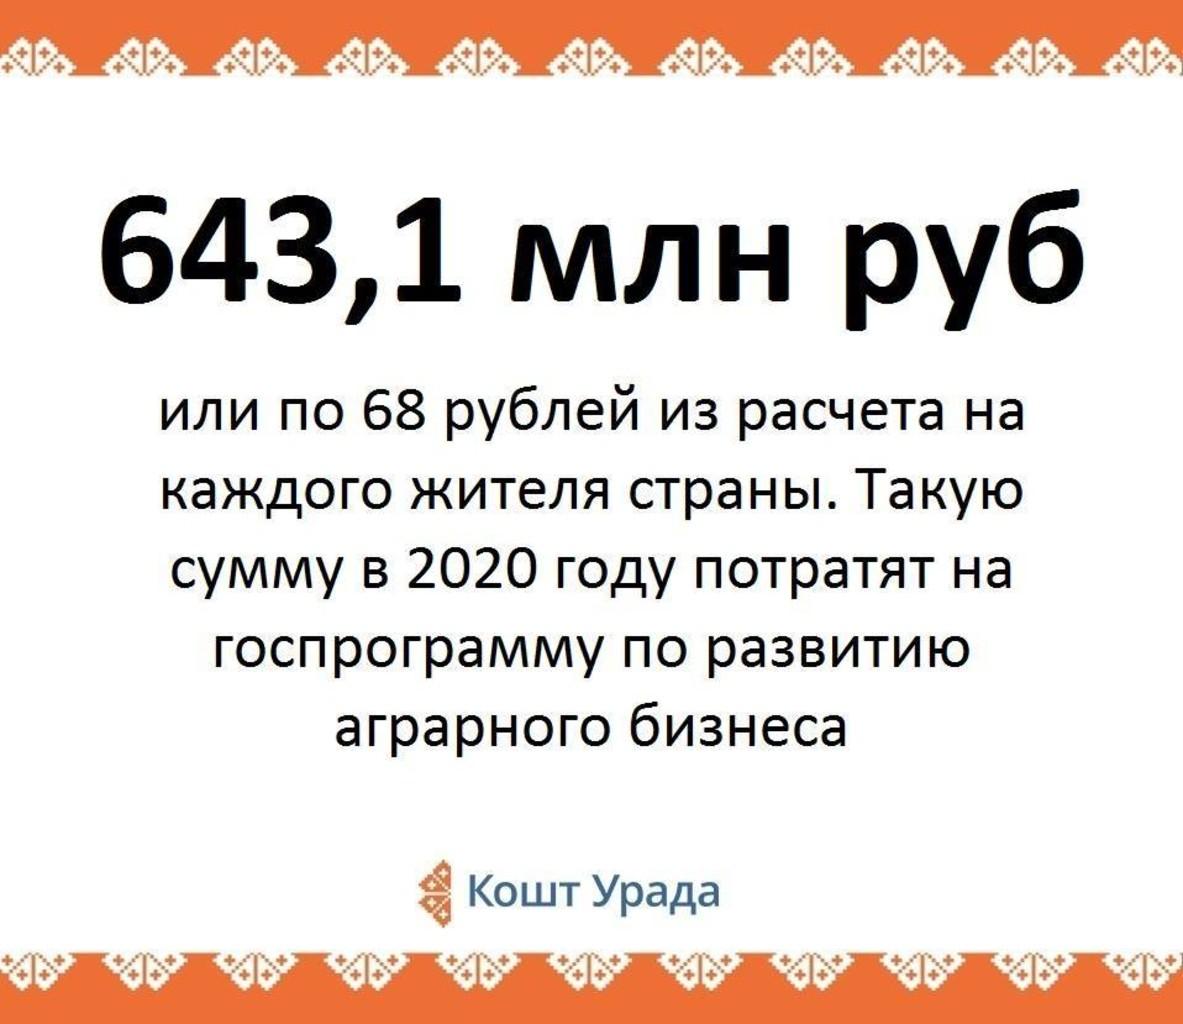 8d5438c6d8b0accb55304724609461c7